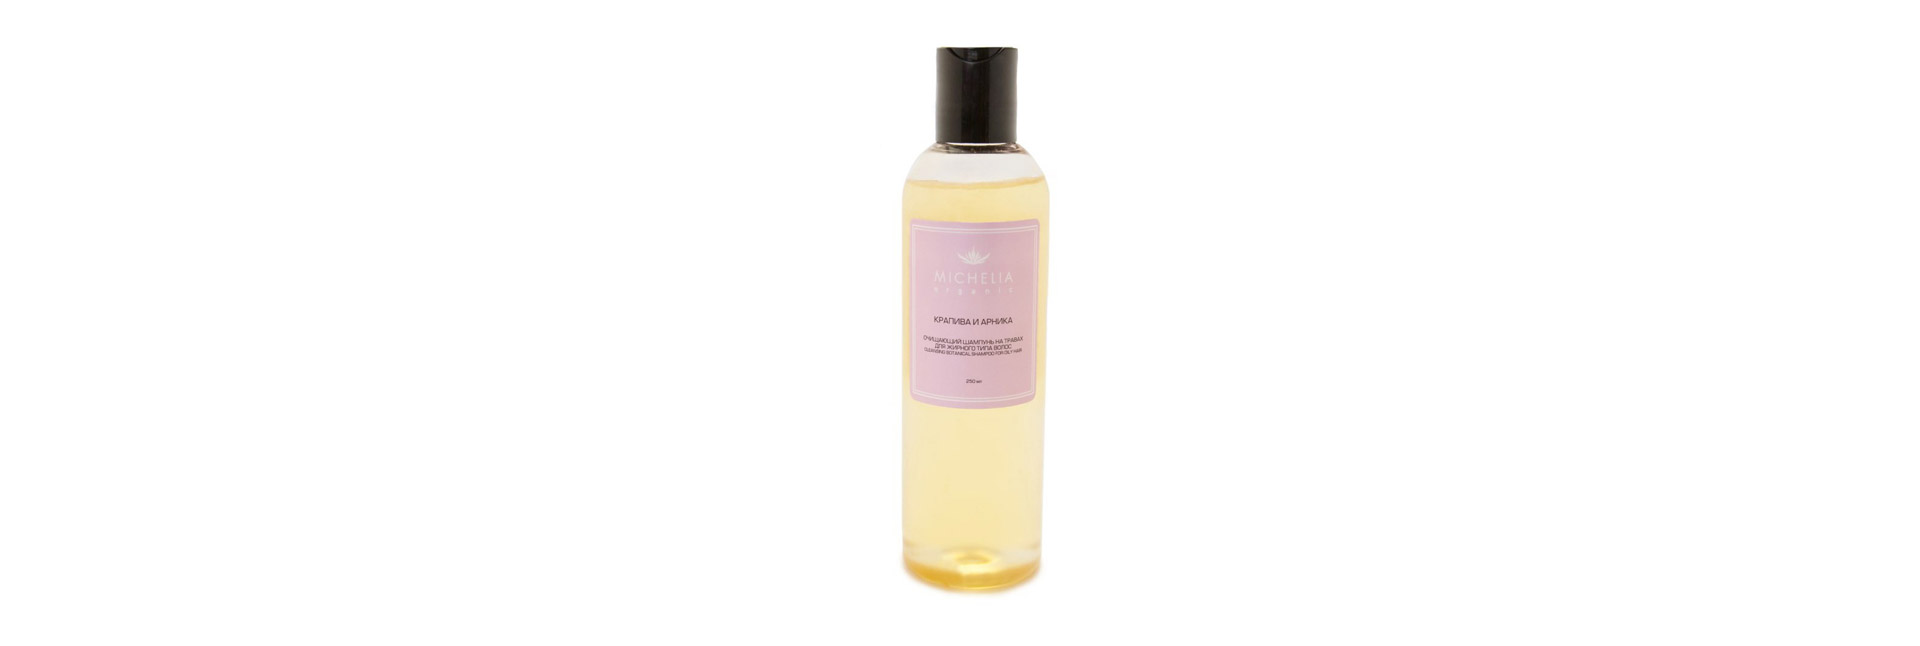 Очищающий шампунь на травах для жирного типа волос Крапива и арника